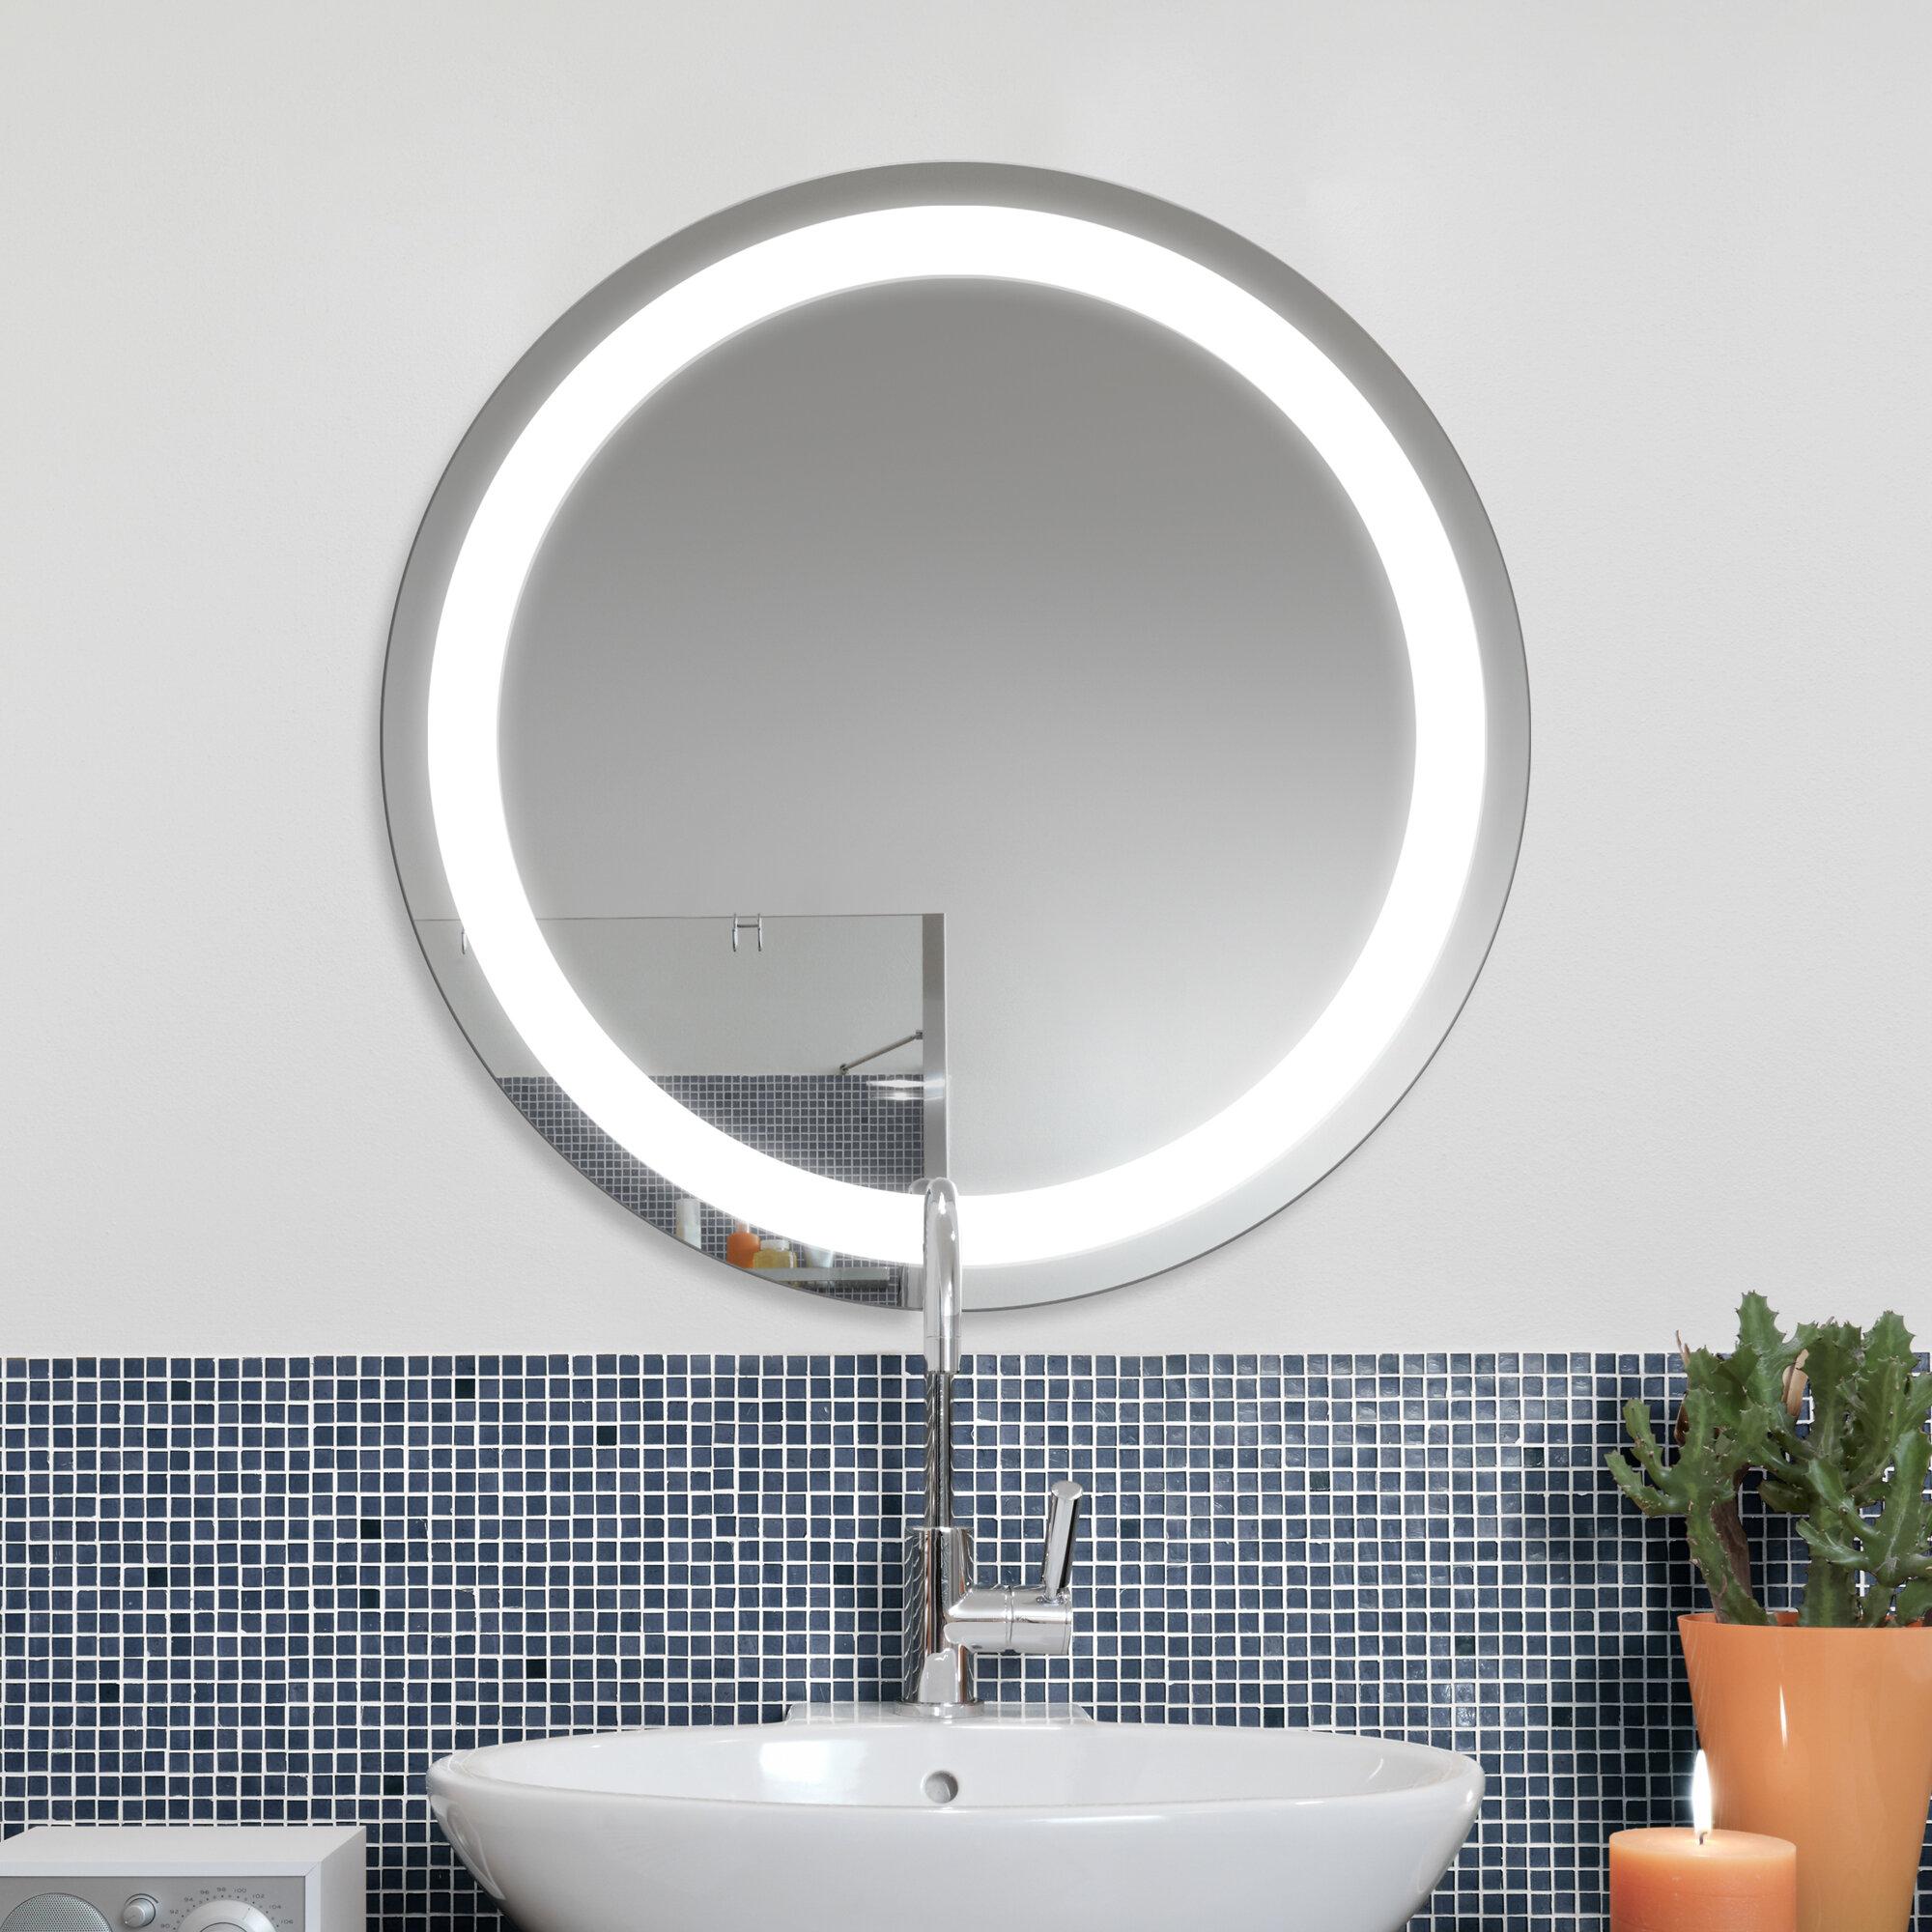 Ruke Jupiter LED Illuminated Bathroom Mirror | Wayfair.co.uk